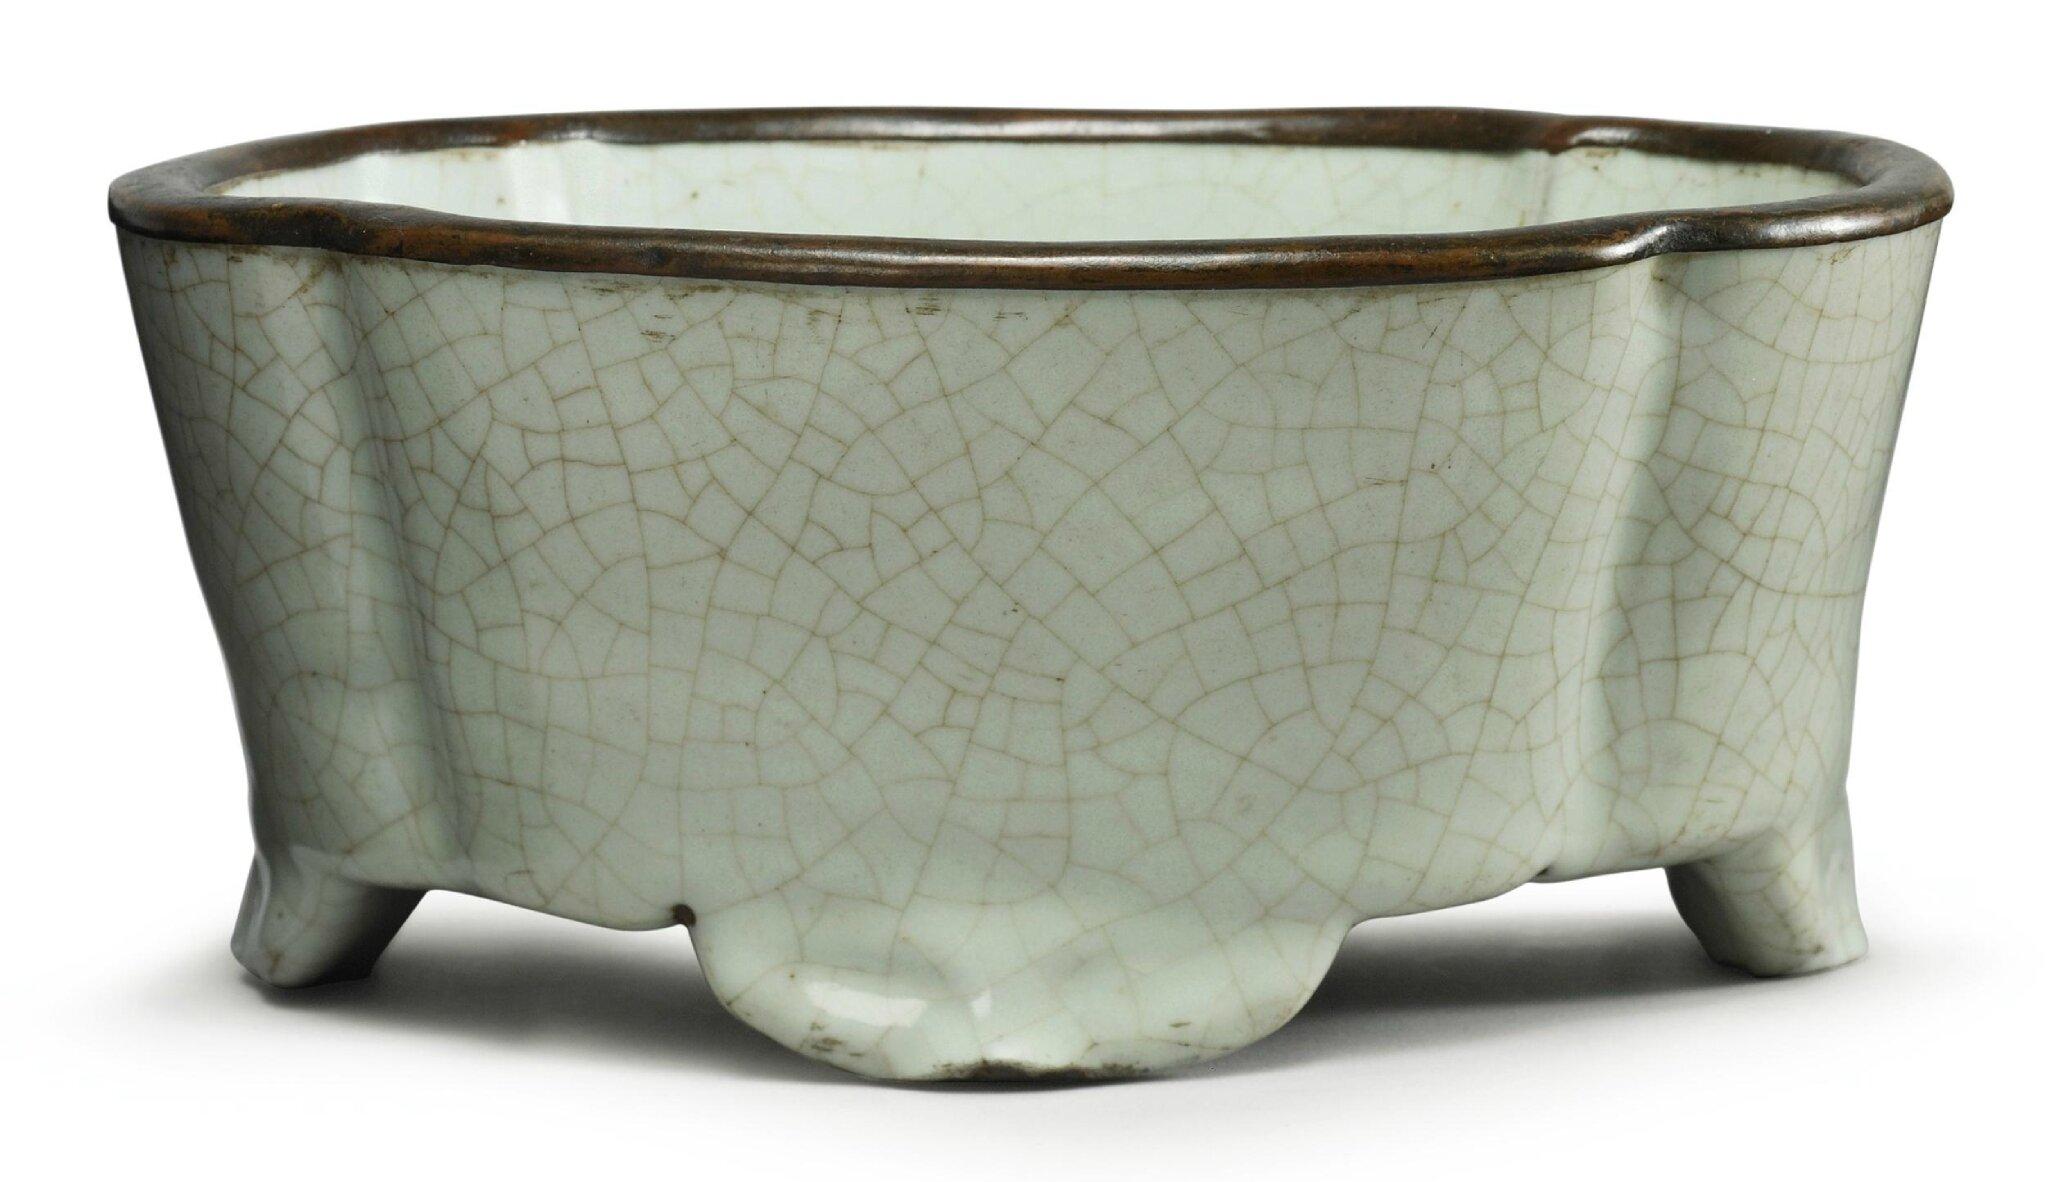 A rare Guan' planter, Yuan-Ming Dynasty, circa 12th-14th century,